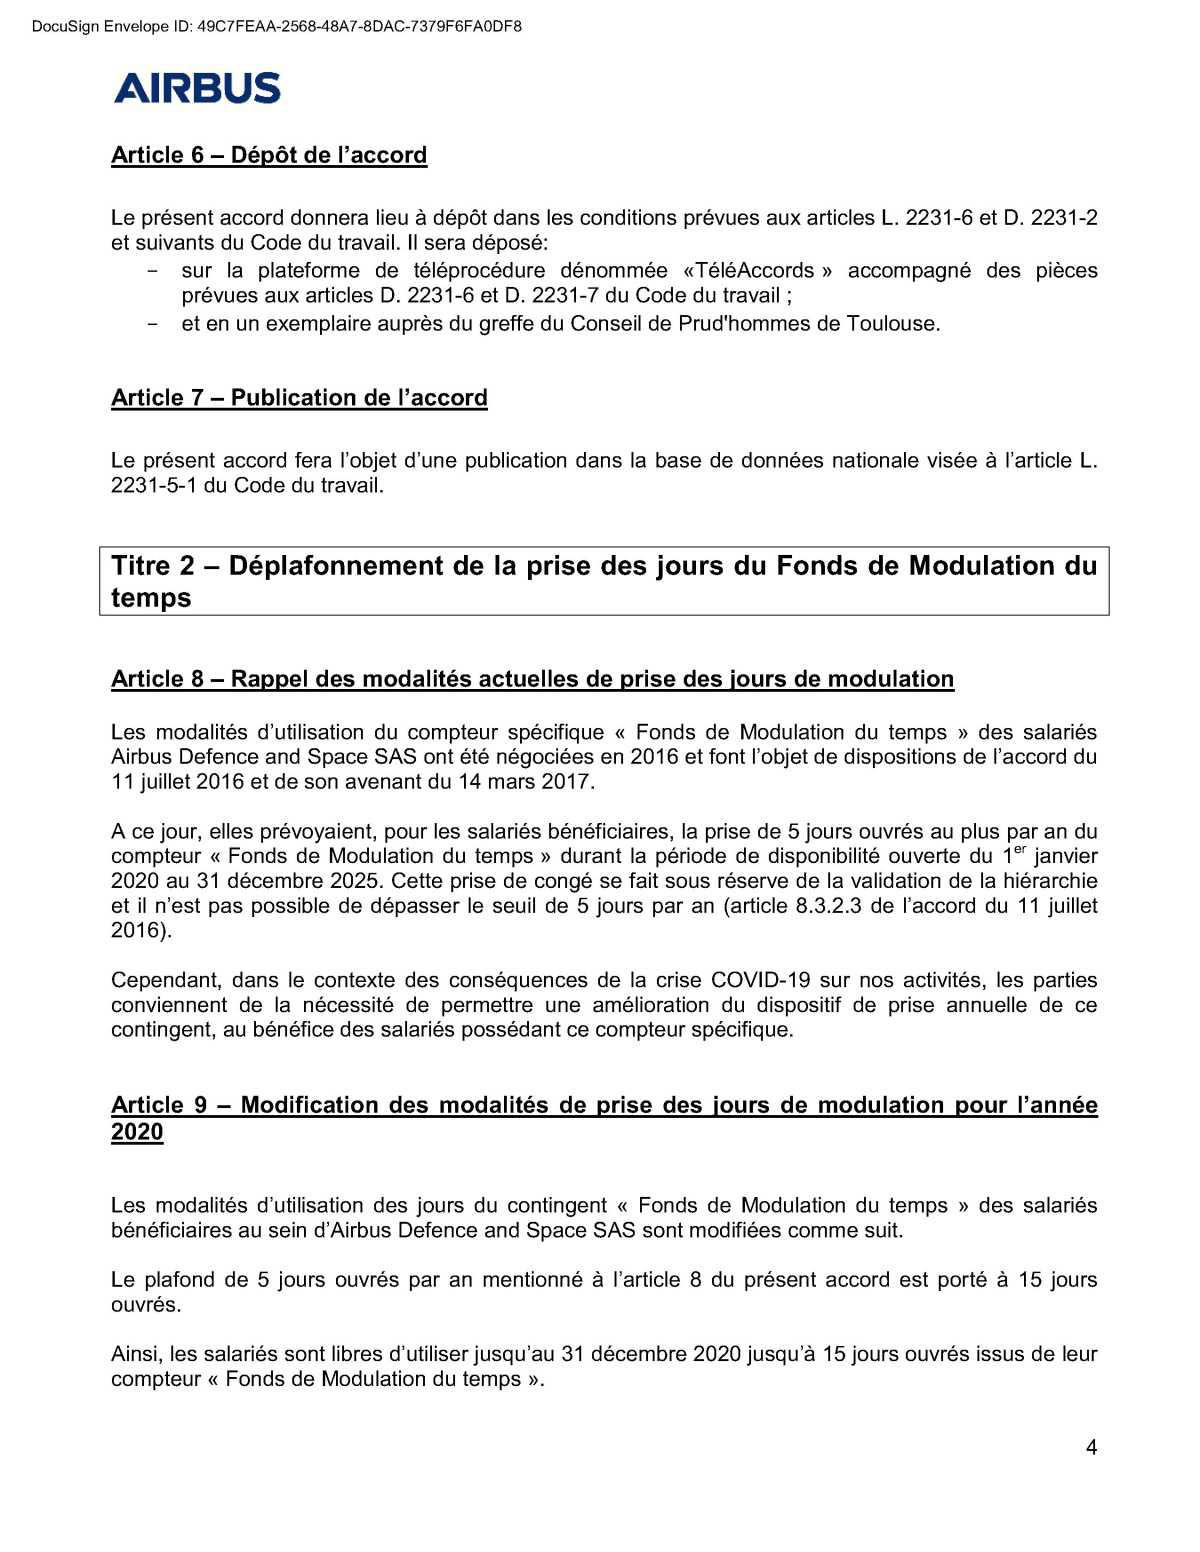 Covid-19 : accord ADS sur les mesures d'accompagnement